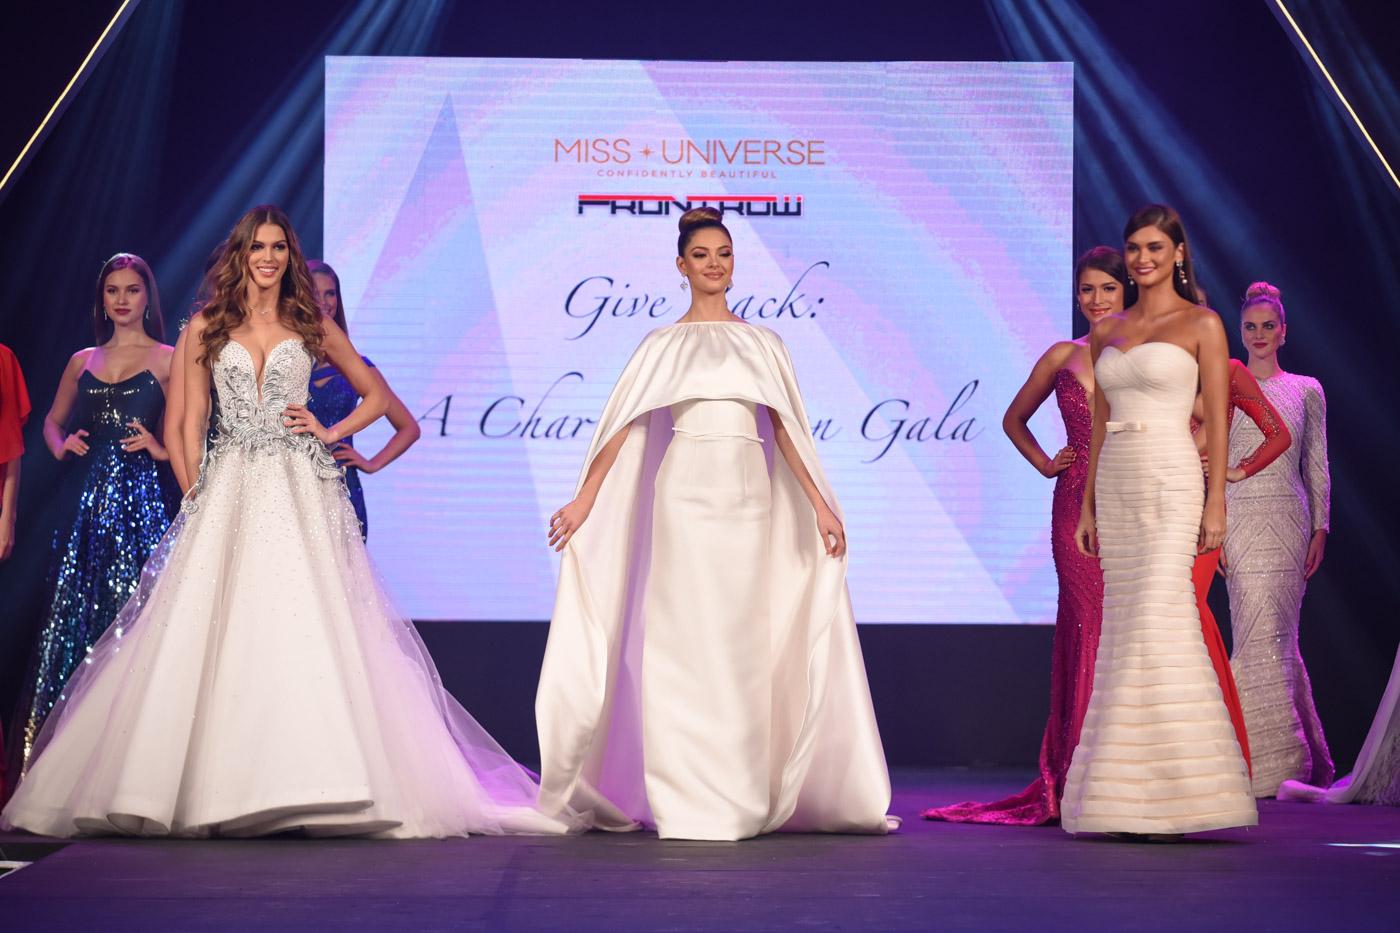 [Obrazek: Miss-Universe-Give-Back-Charity-Fashion-...17-054.jpg]